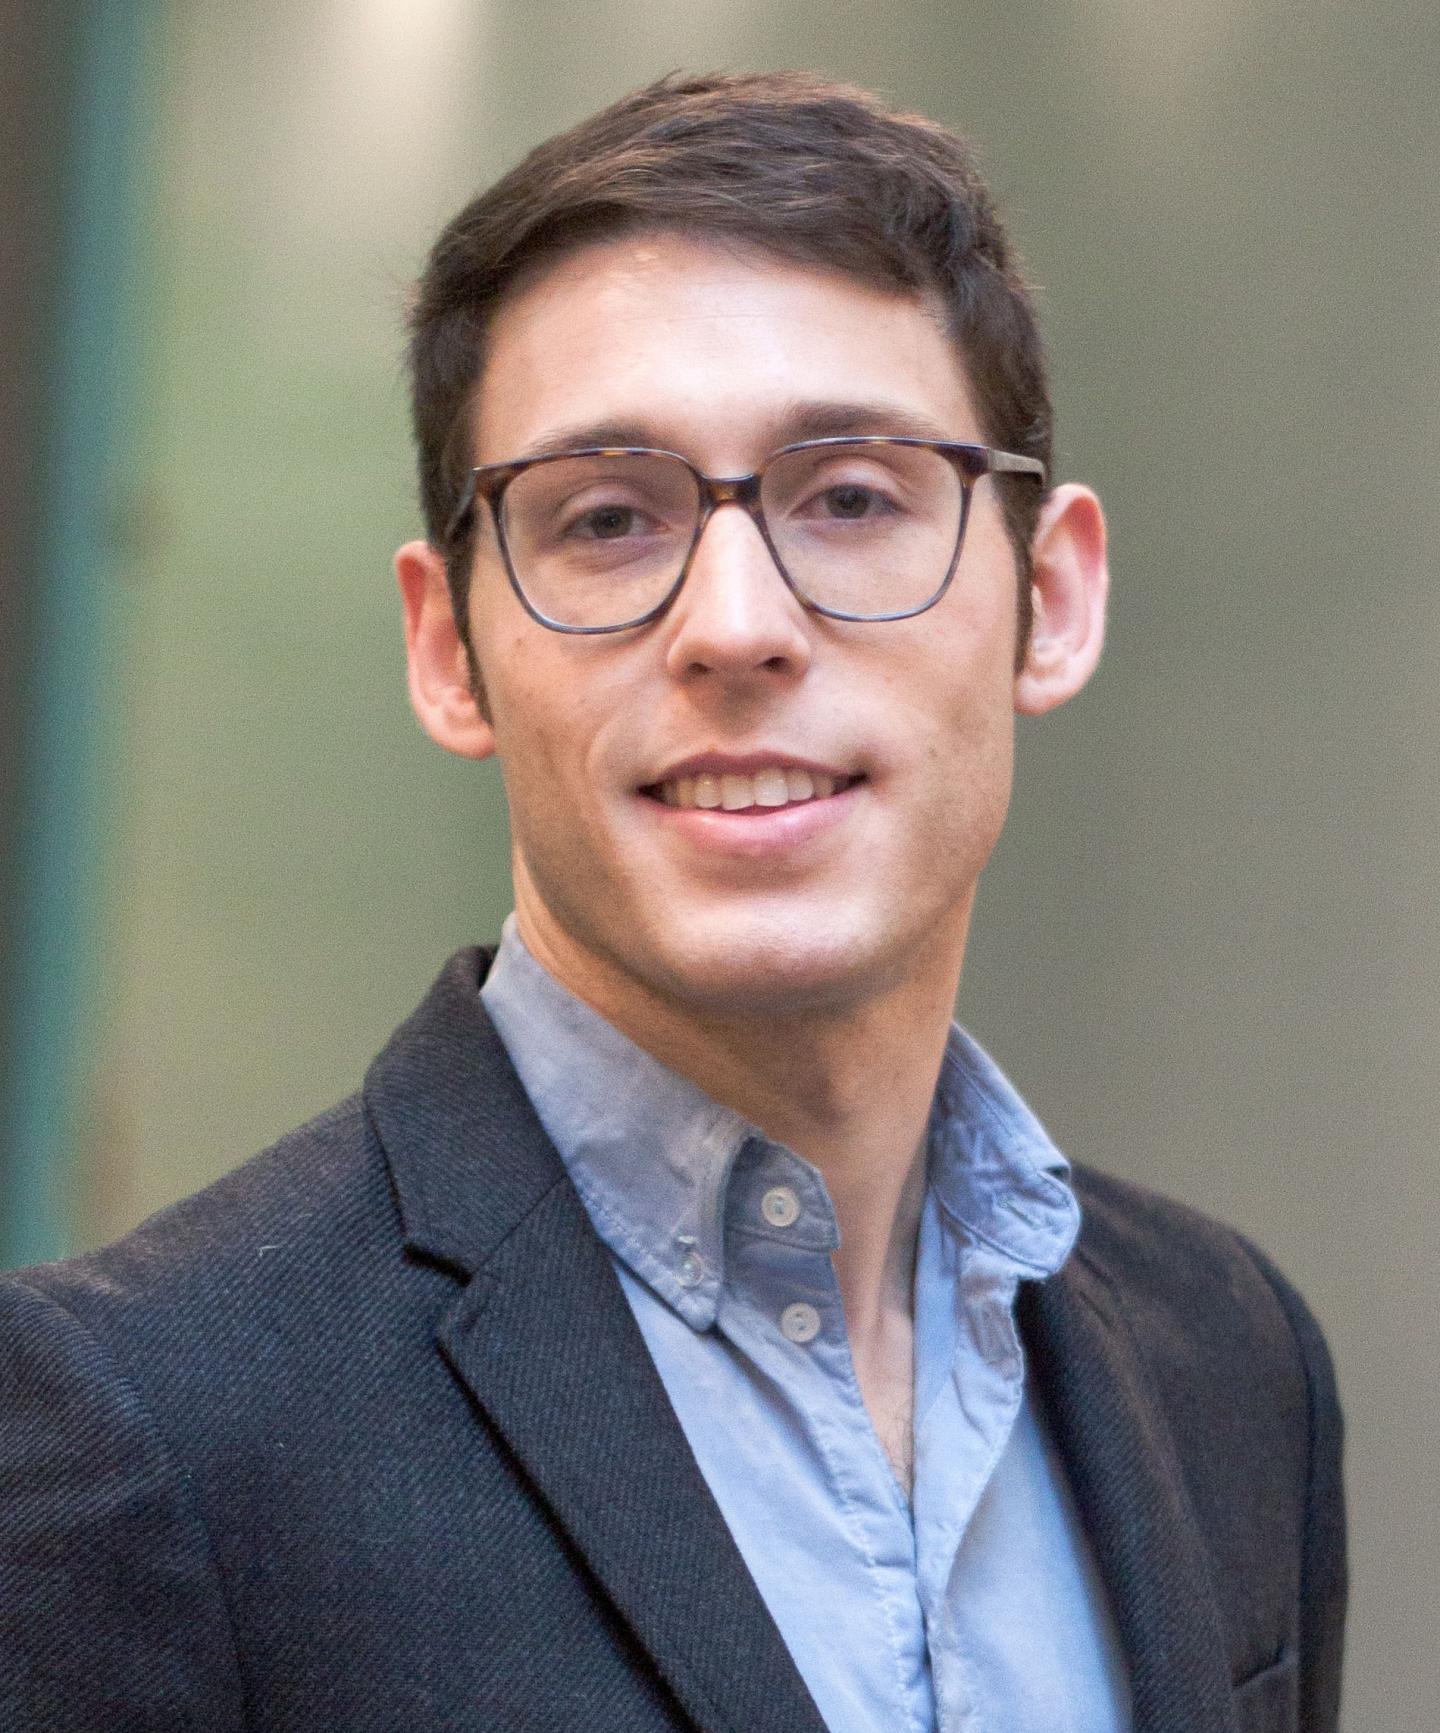 Jonathan Freeman, New York University